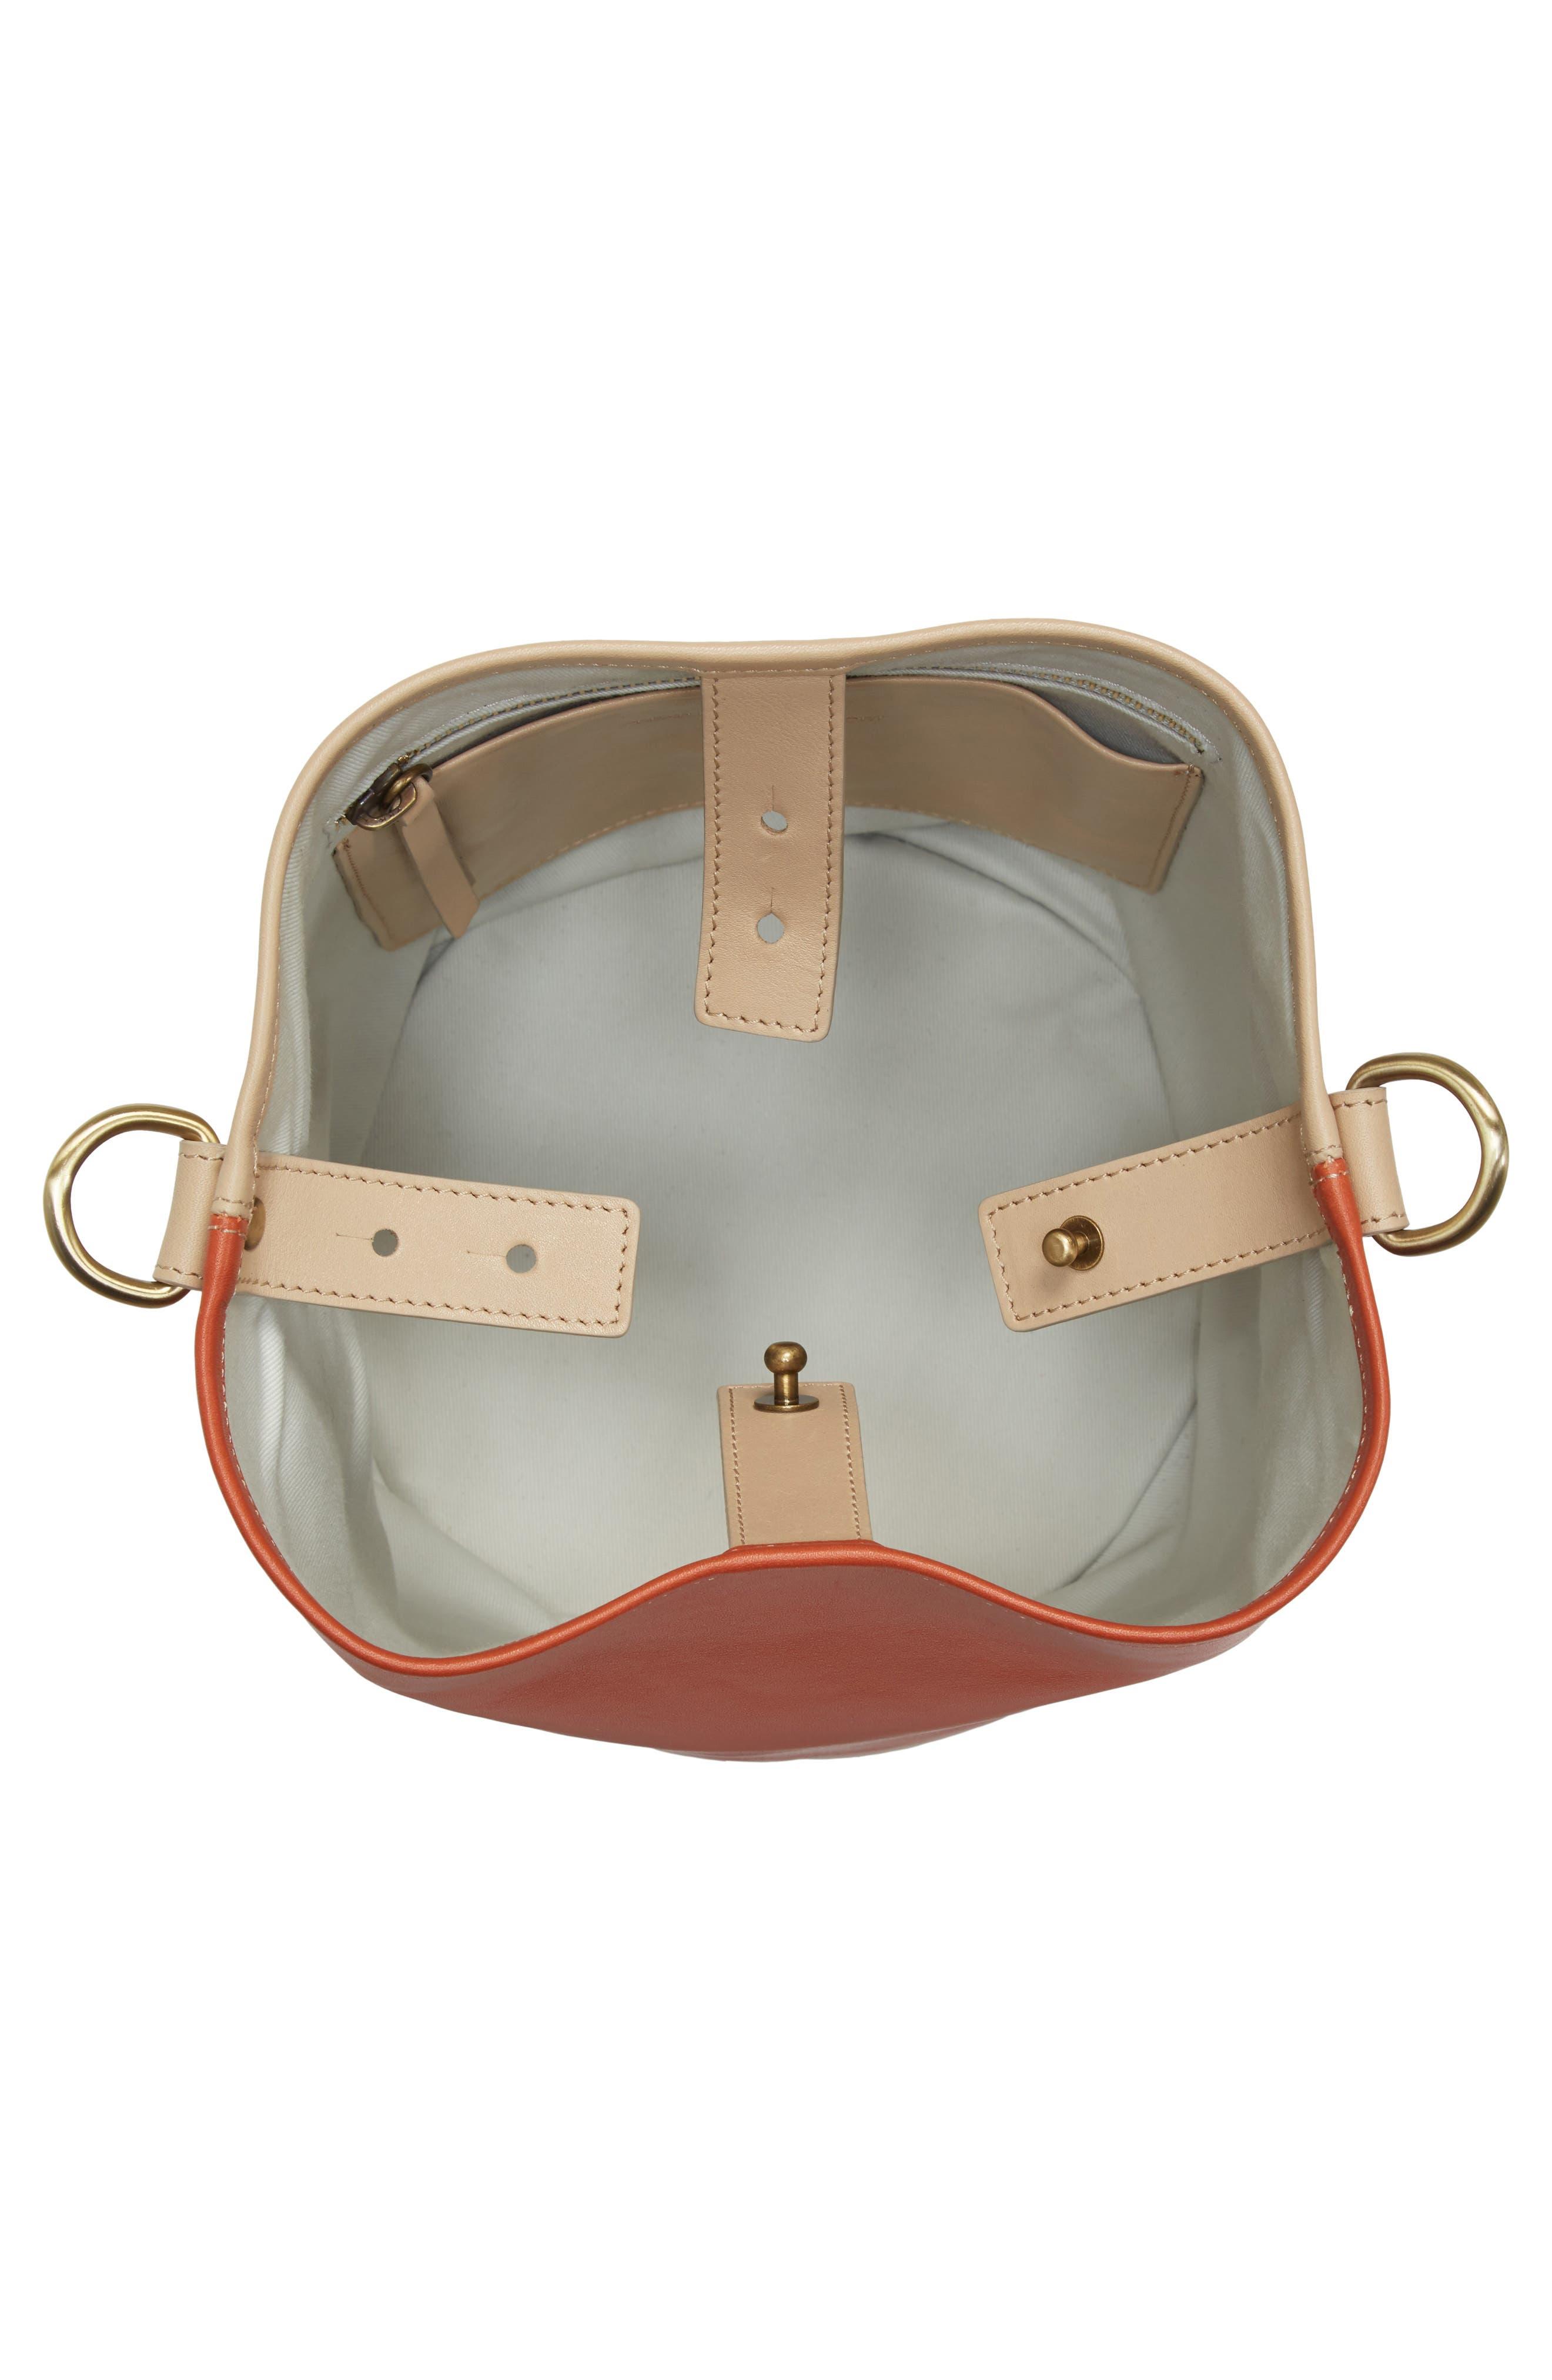 Small Bucket Bicolor Leather Bag,                             Alternate thumbnail 4, color,                             Clove/ Cappuccino